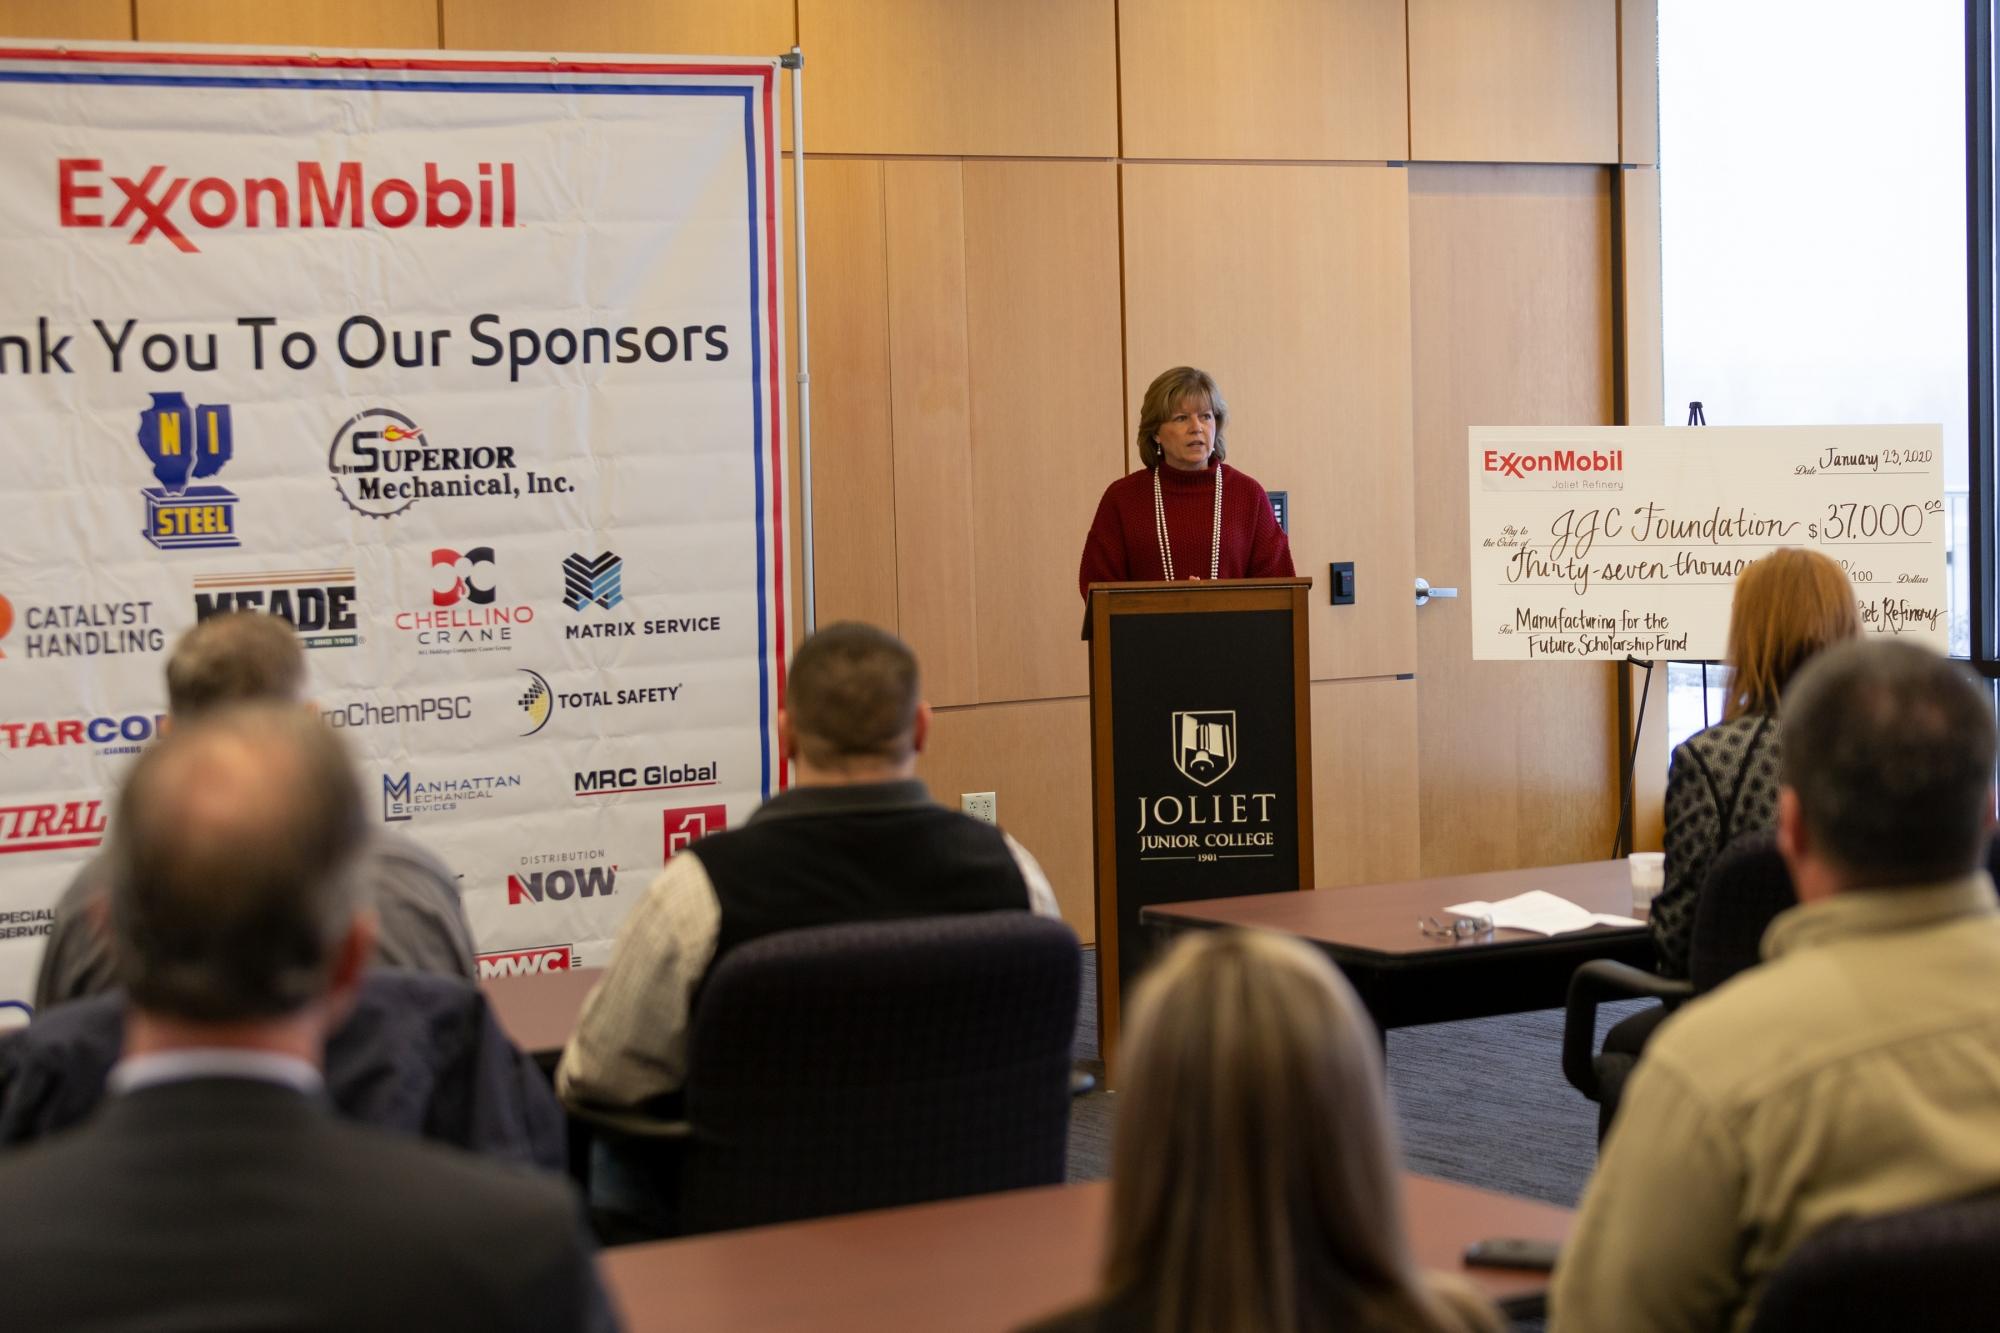 ExxonMobil donation - Dr. Mitchell